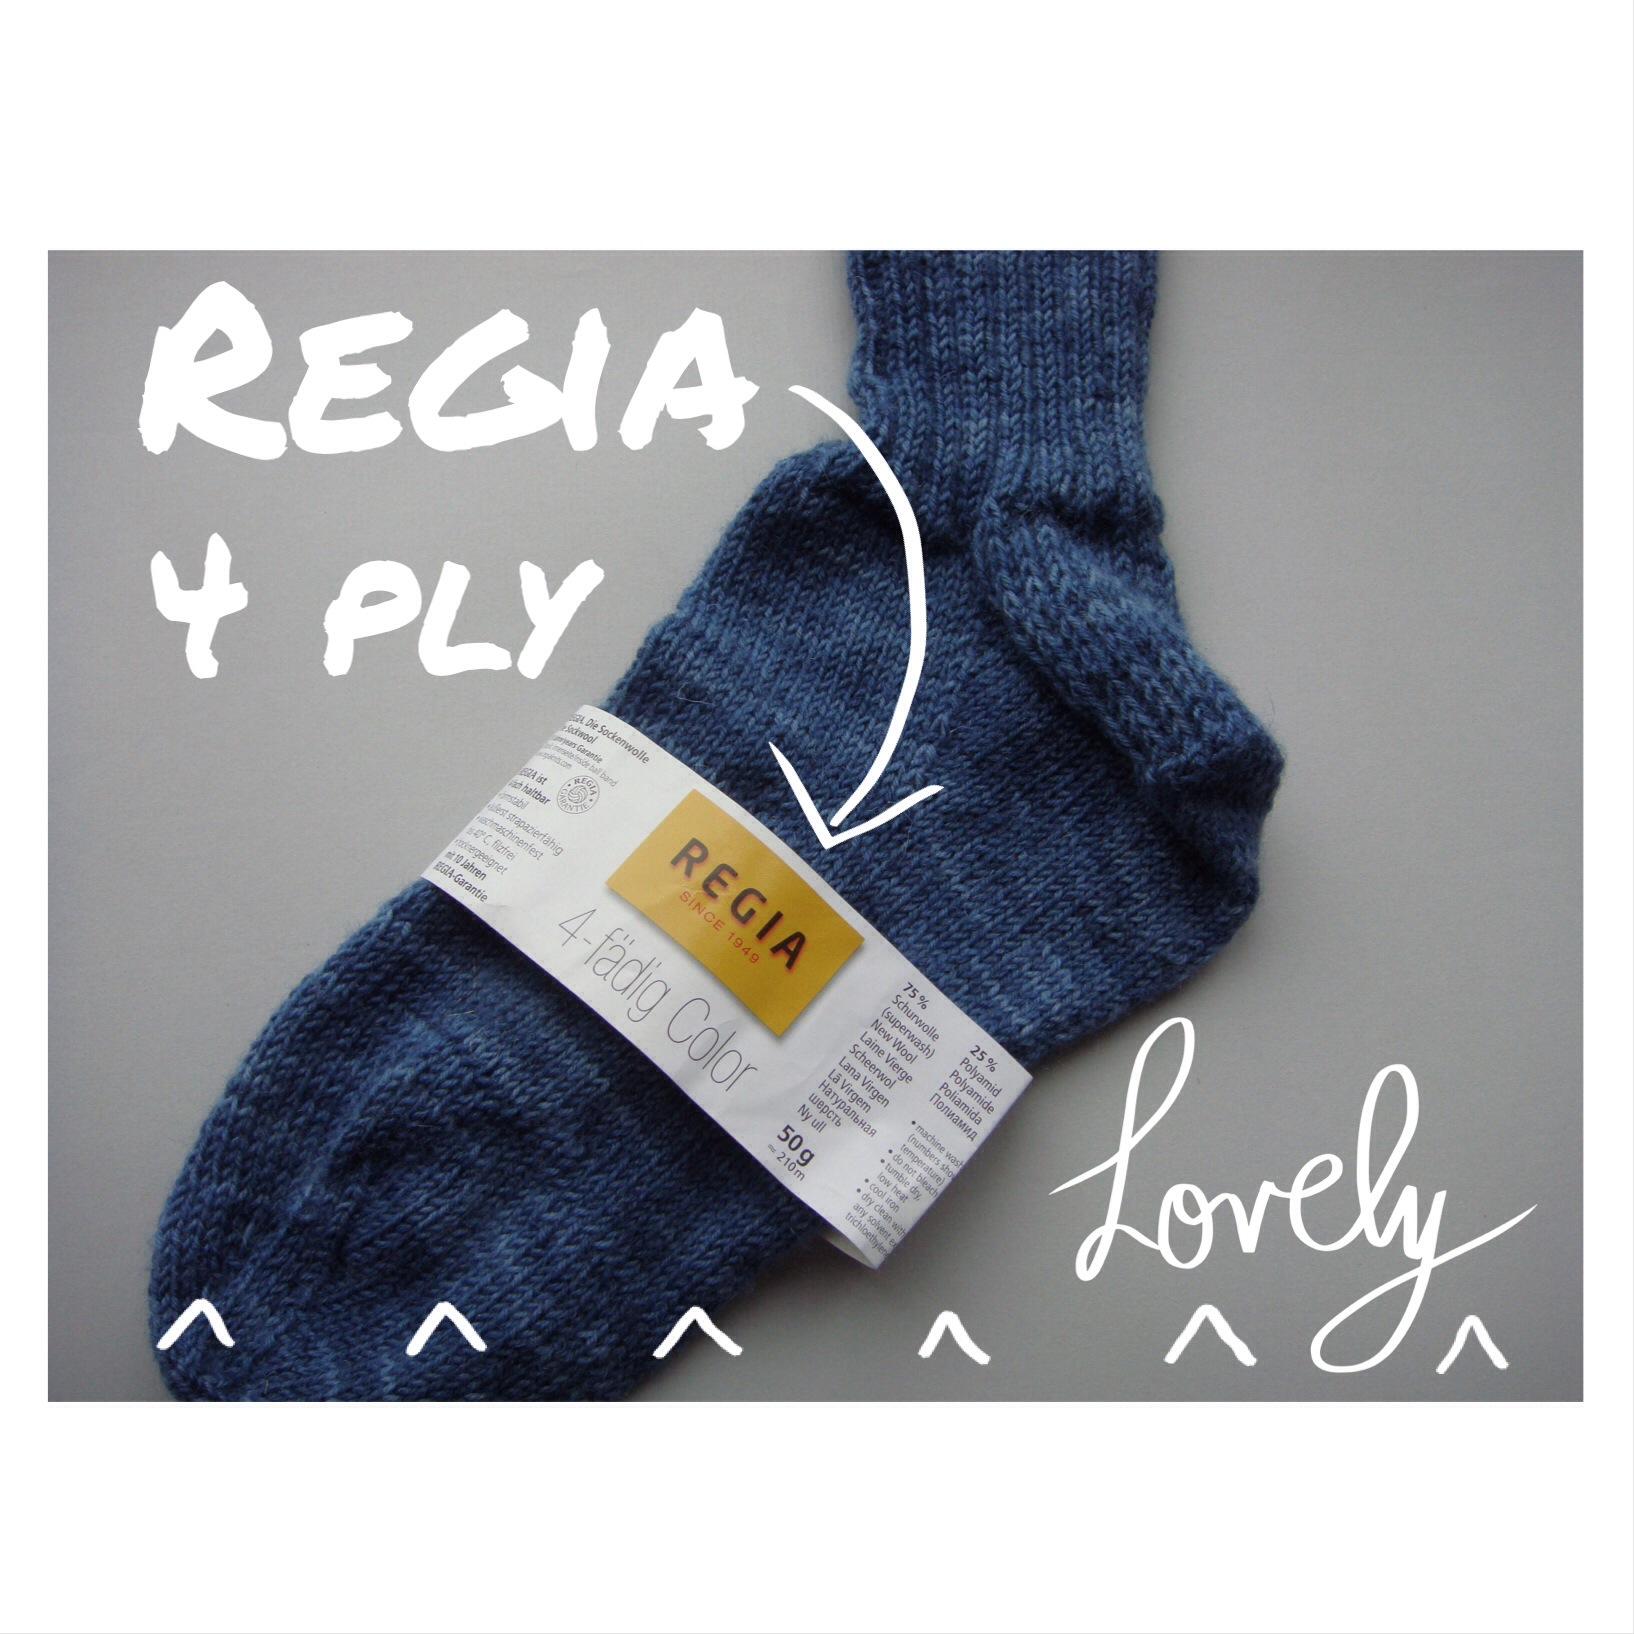 Regia 4 ply knitted socks